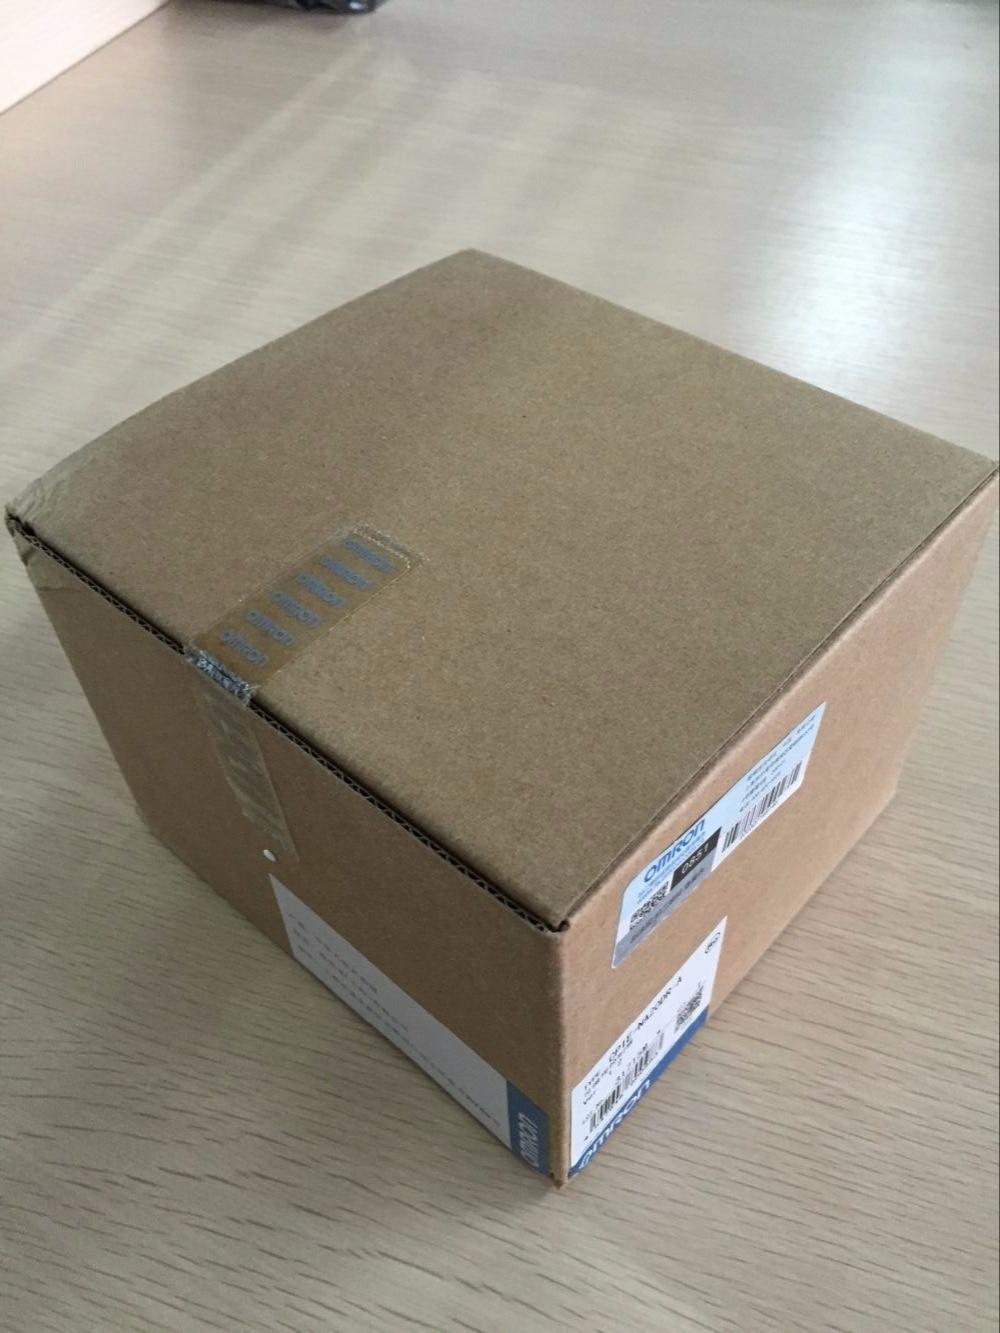 ФОТО New original DVP14EC00R3 PLC DI 8 DO 6 Relay 100-240VAC well tested working three months warranty